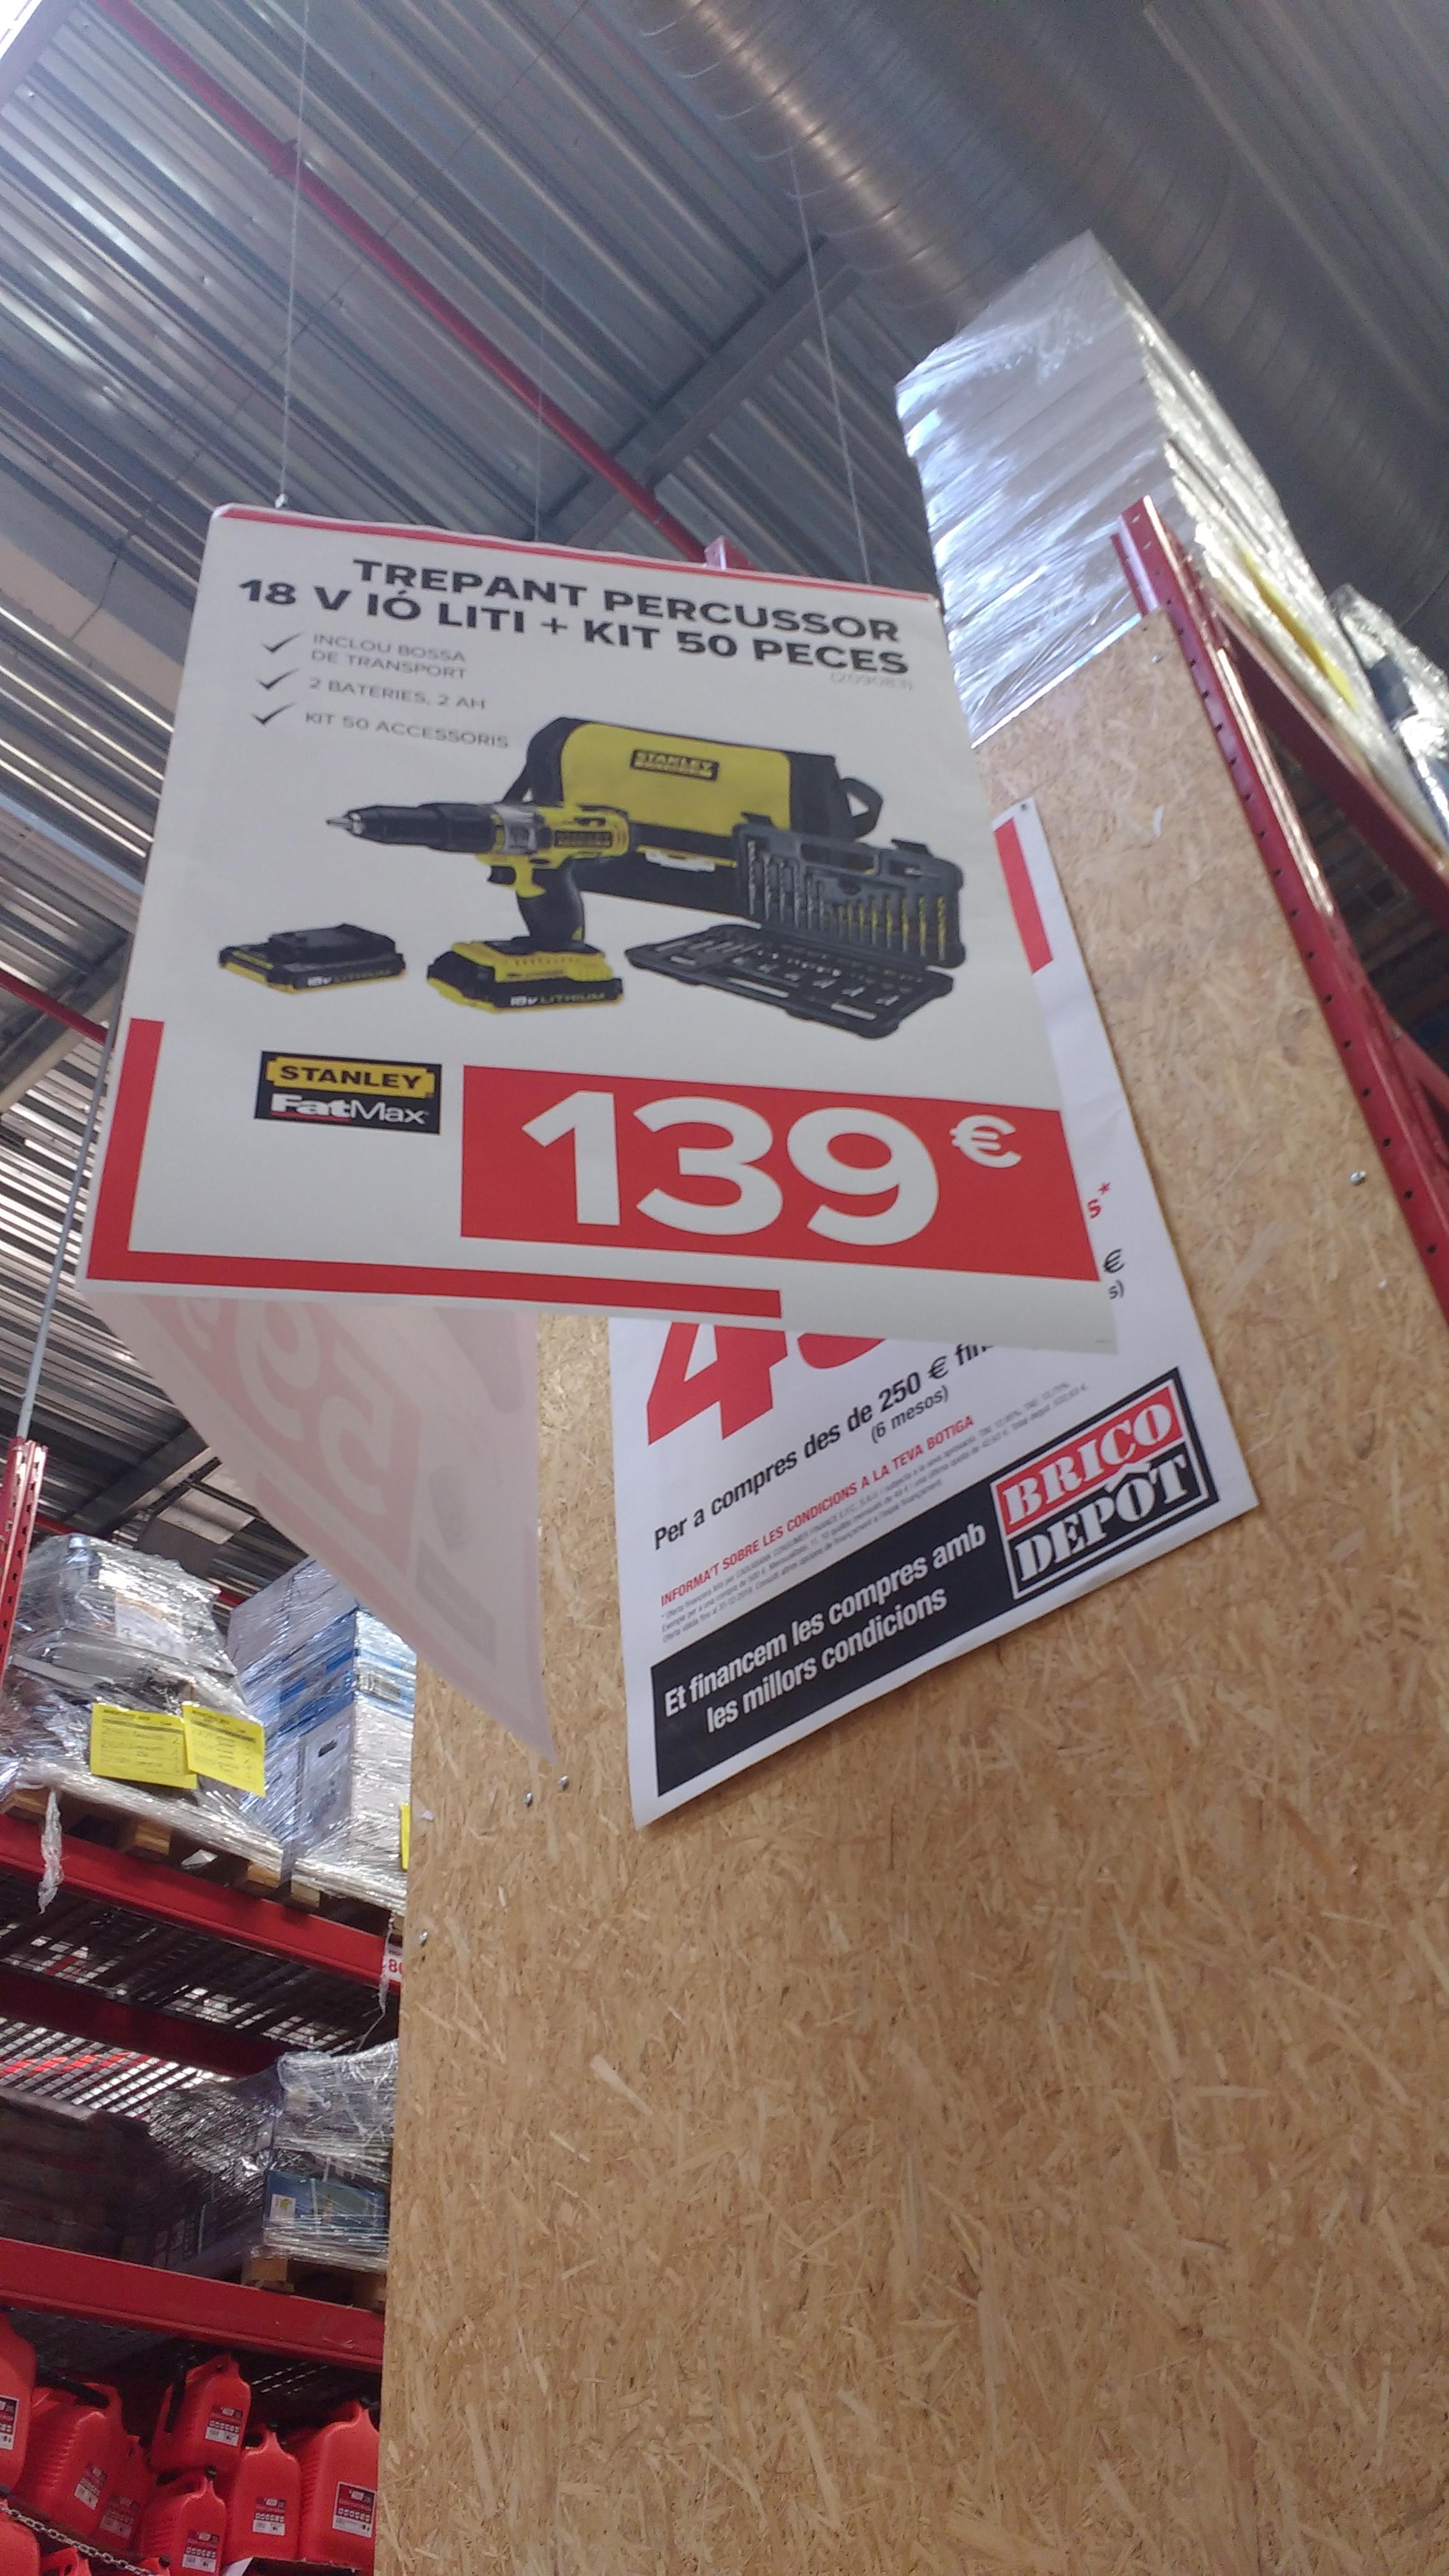 Taladro percutor Stanley FKCK626D25A con accesorios tiendas bricodepot